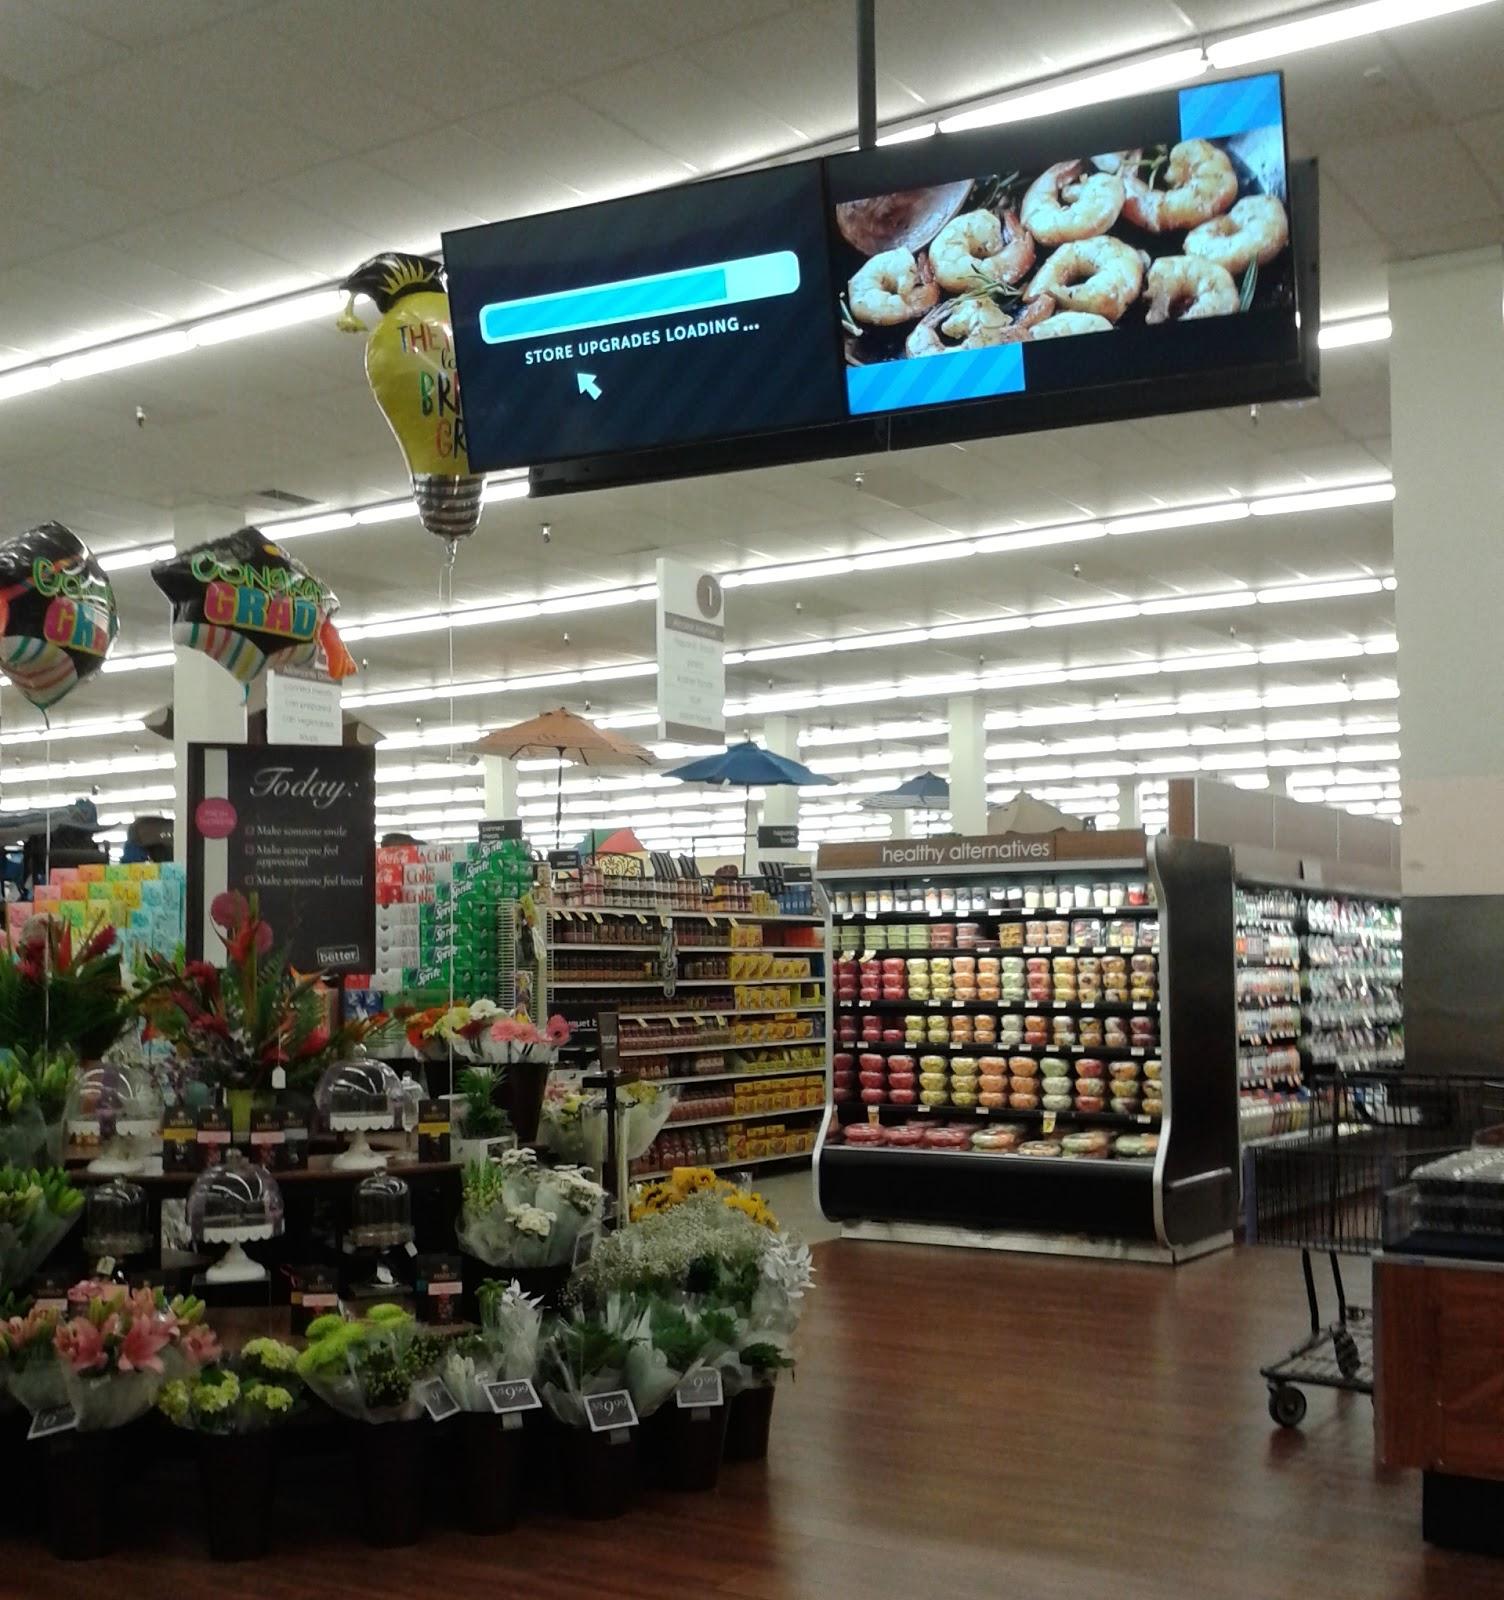 Albertsons Florida Blog: Here's Safeway! (Safeway #3304